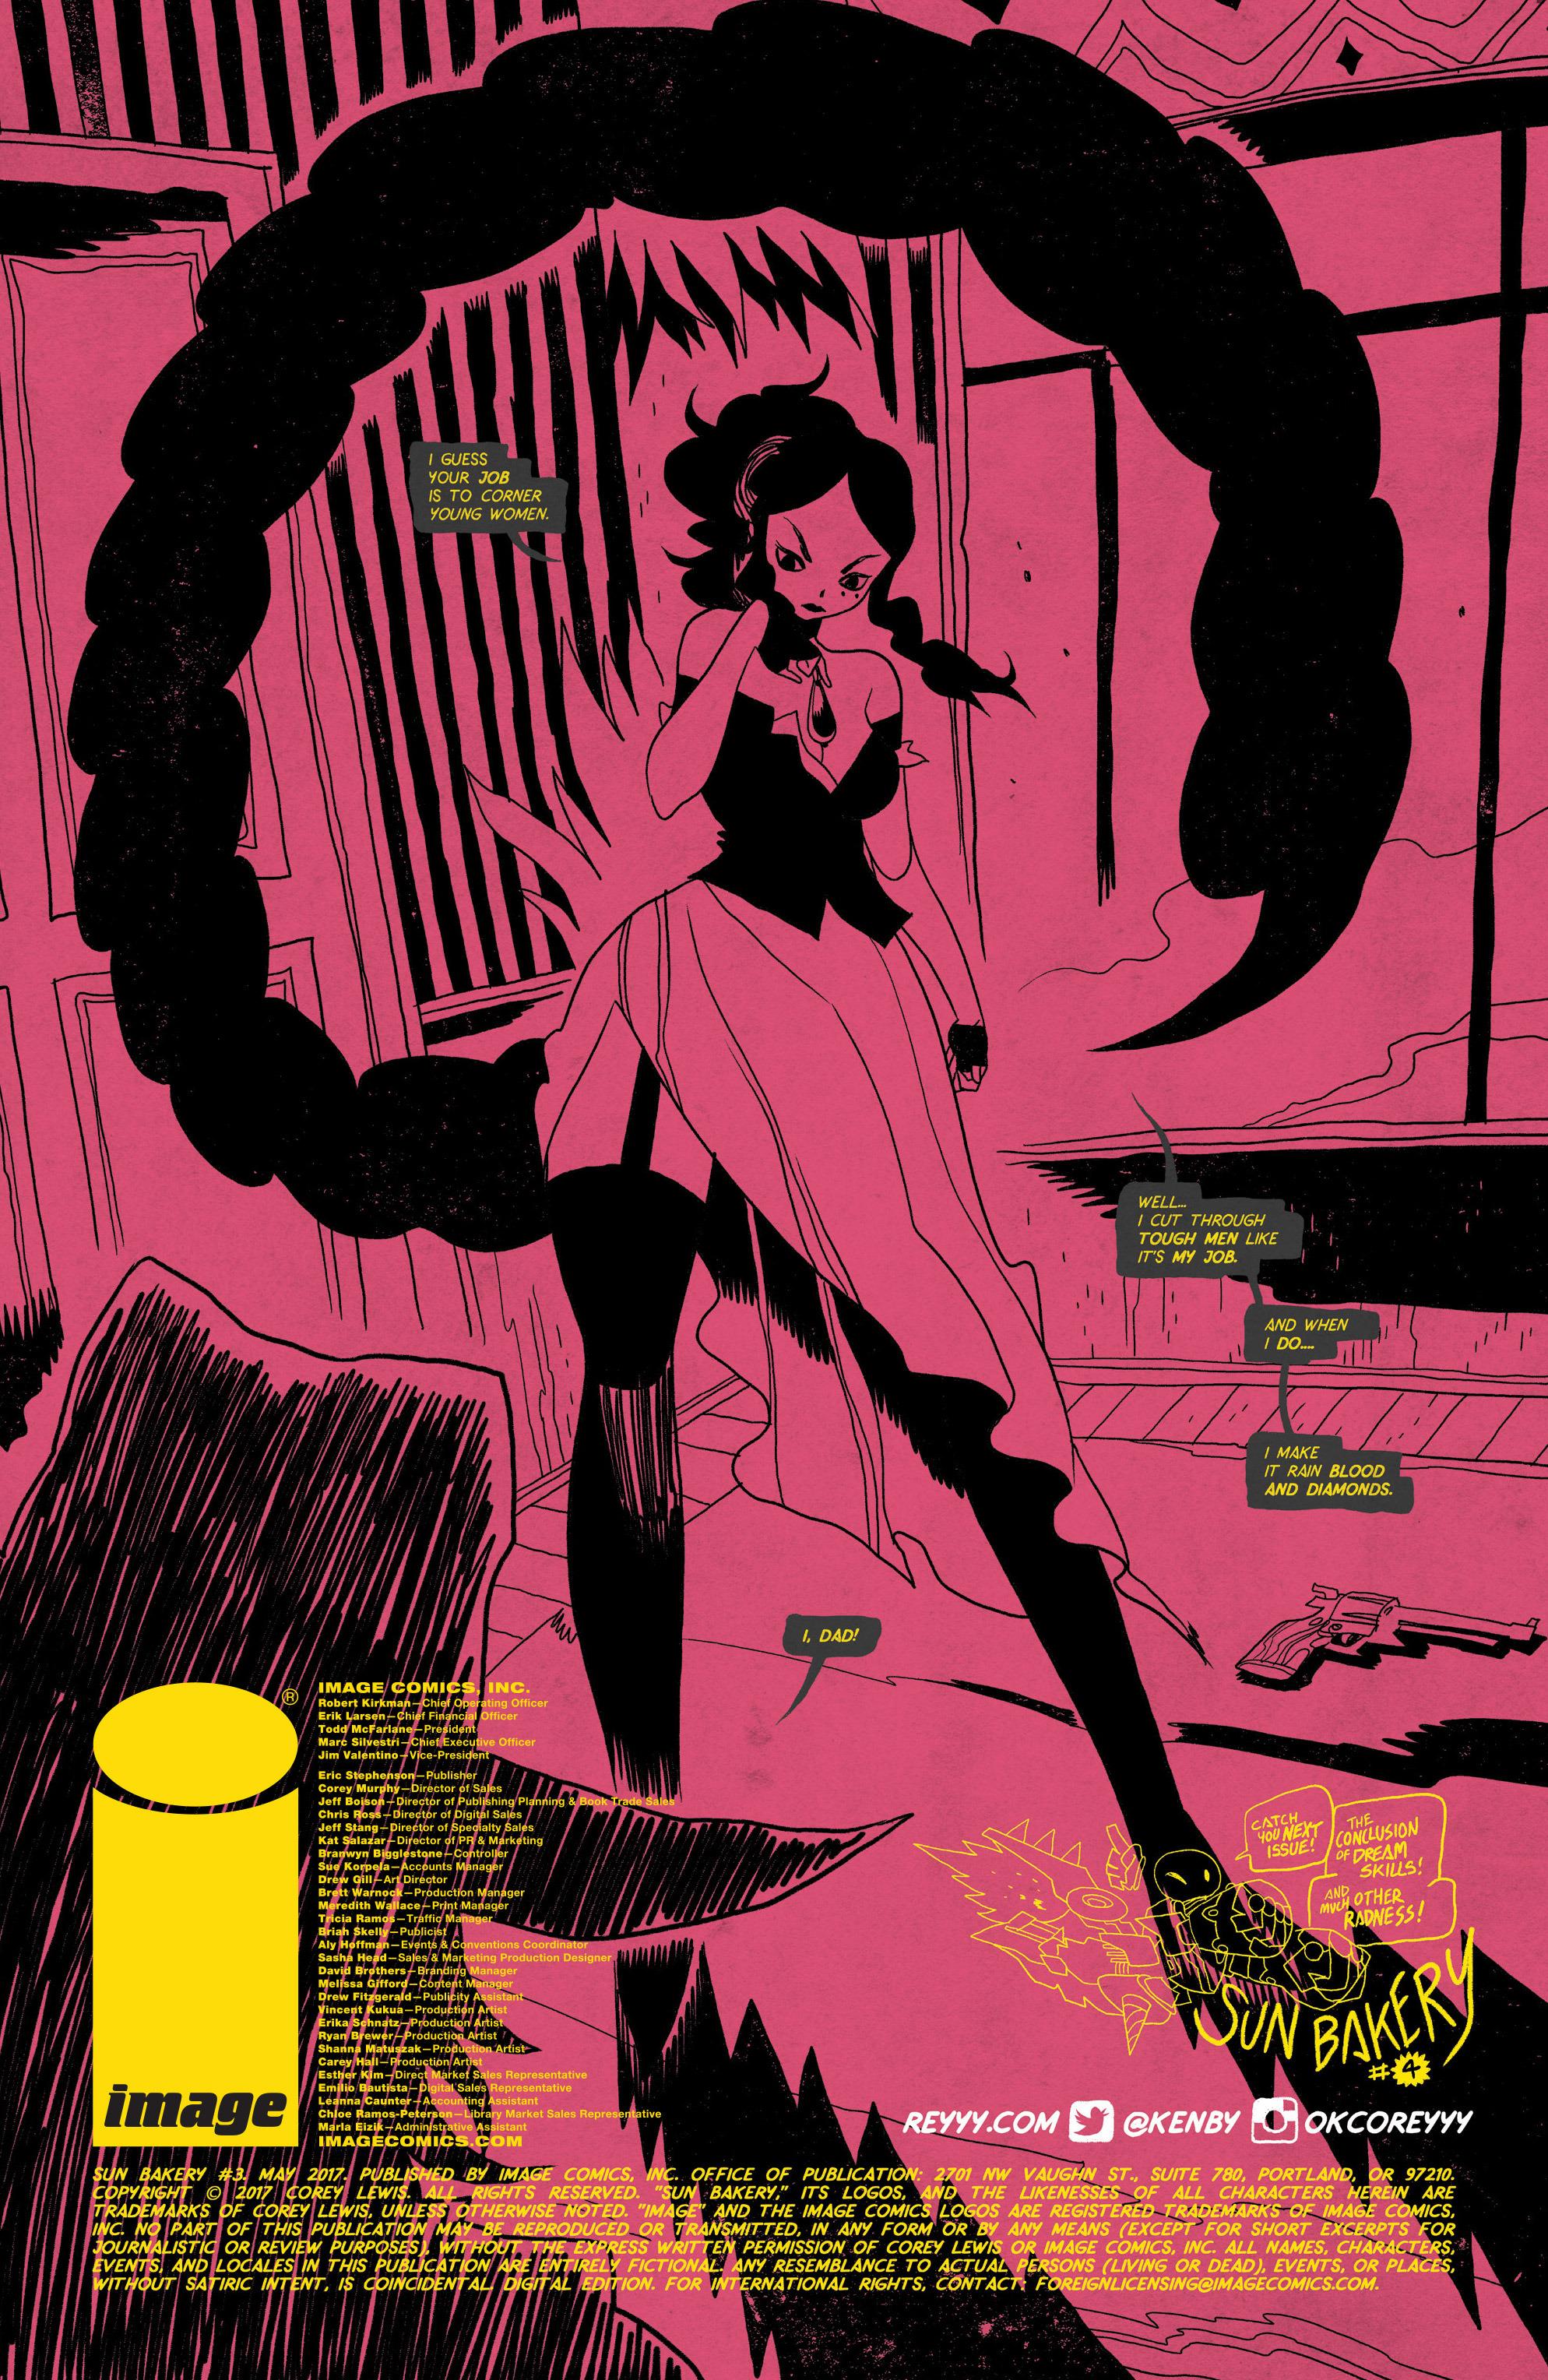 Read online Sun Bakery comic -  Issue #3 - 46